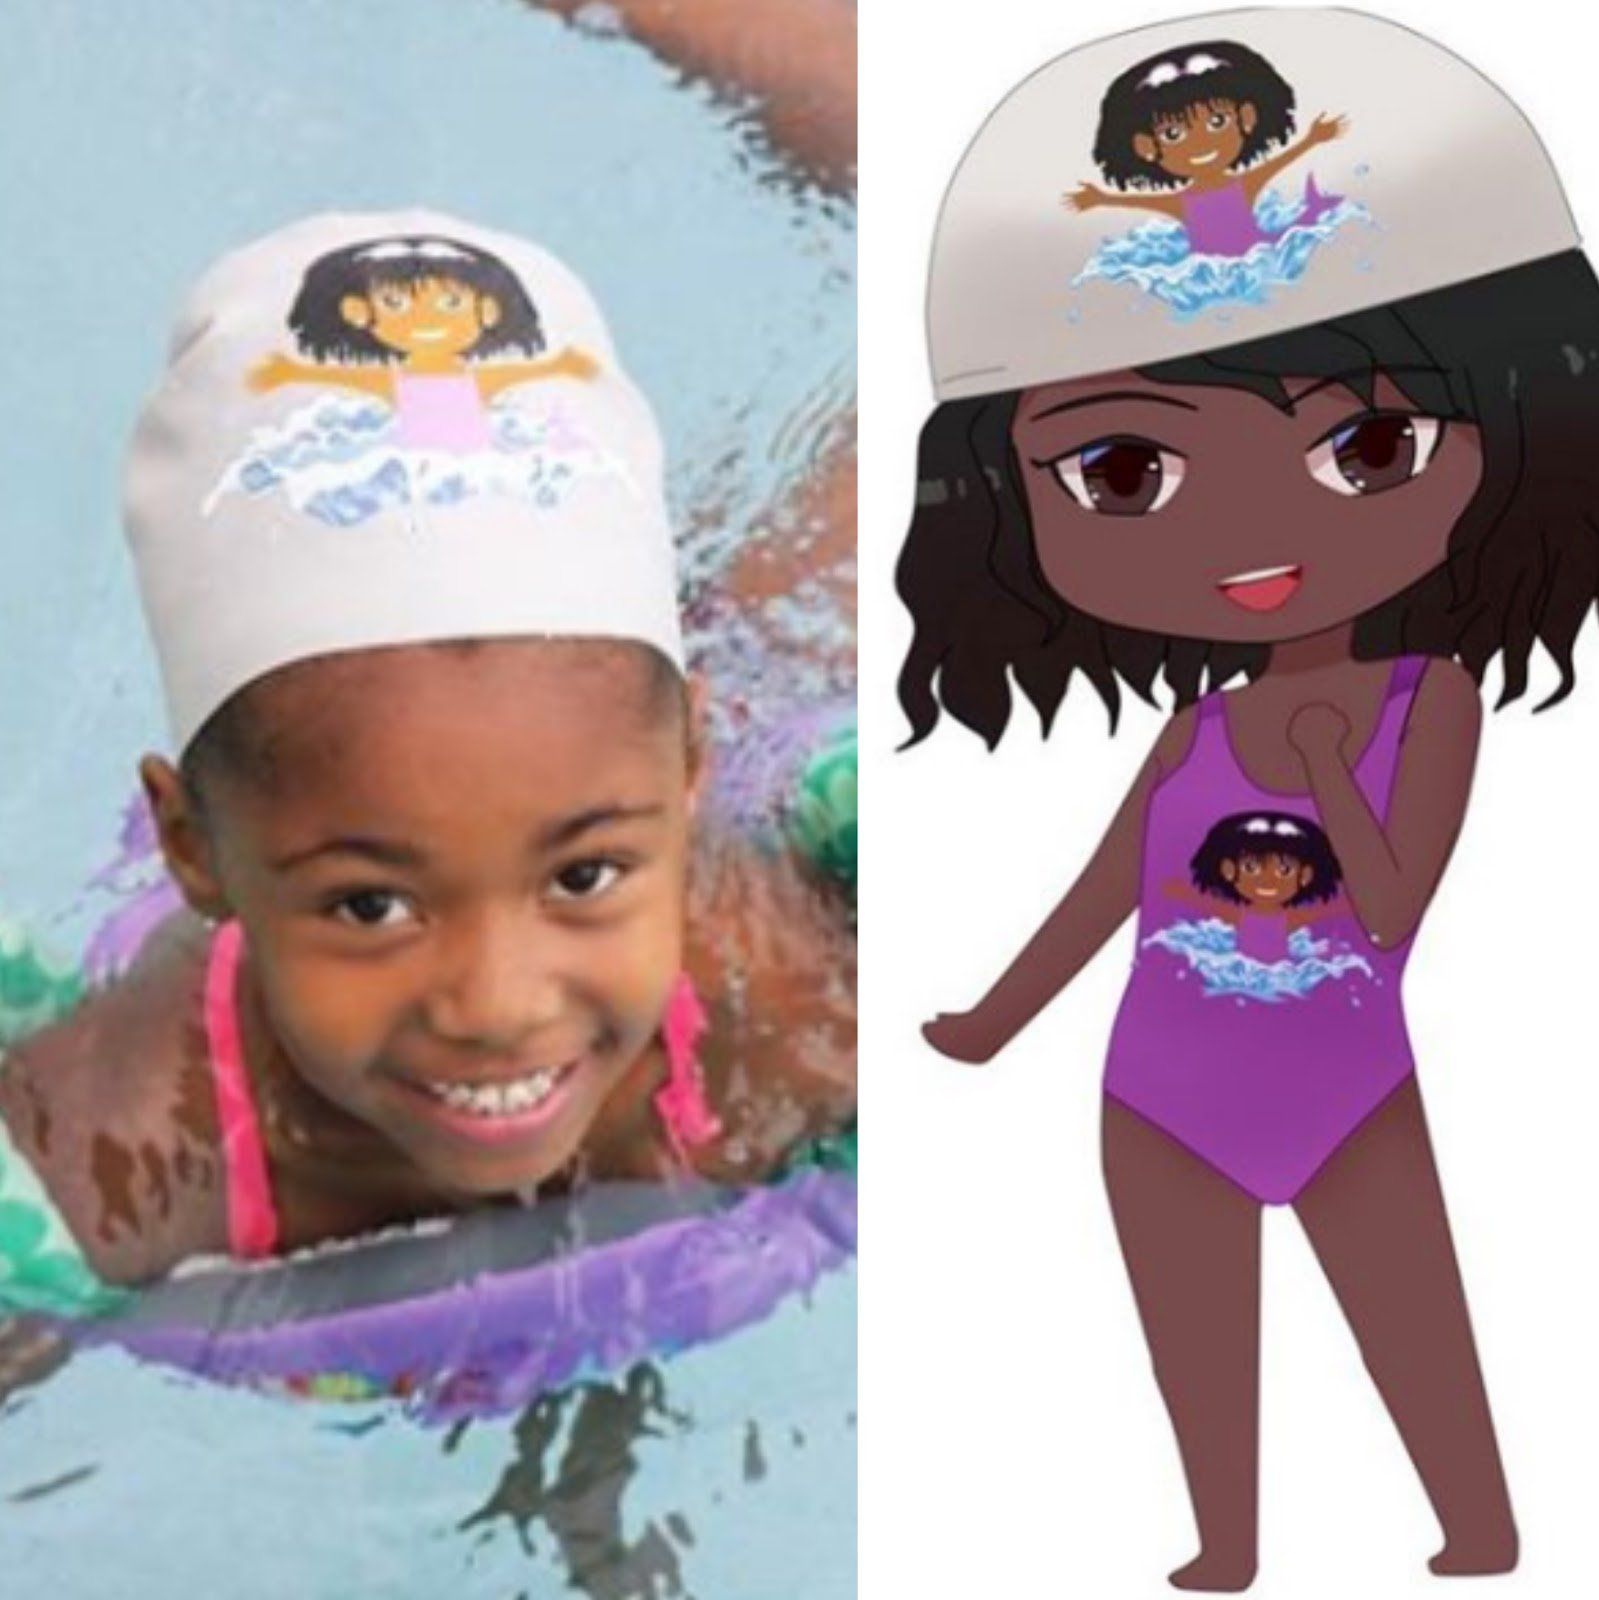 Swimmie Caps Motivate Black & Brown Kids to Swim